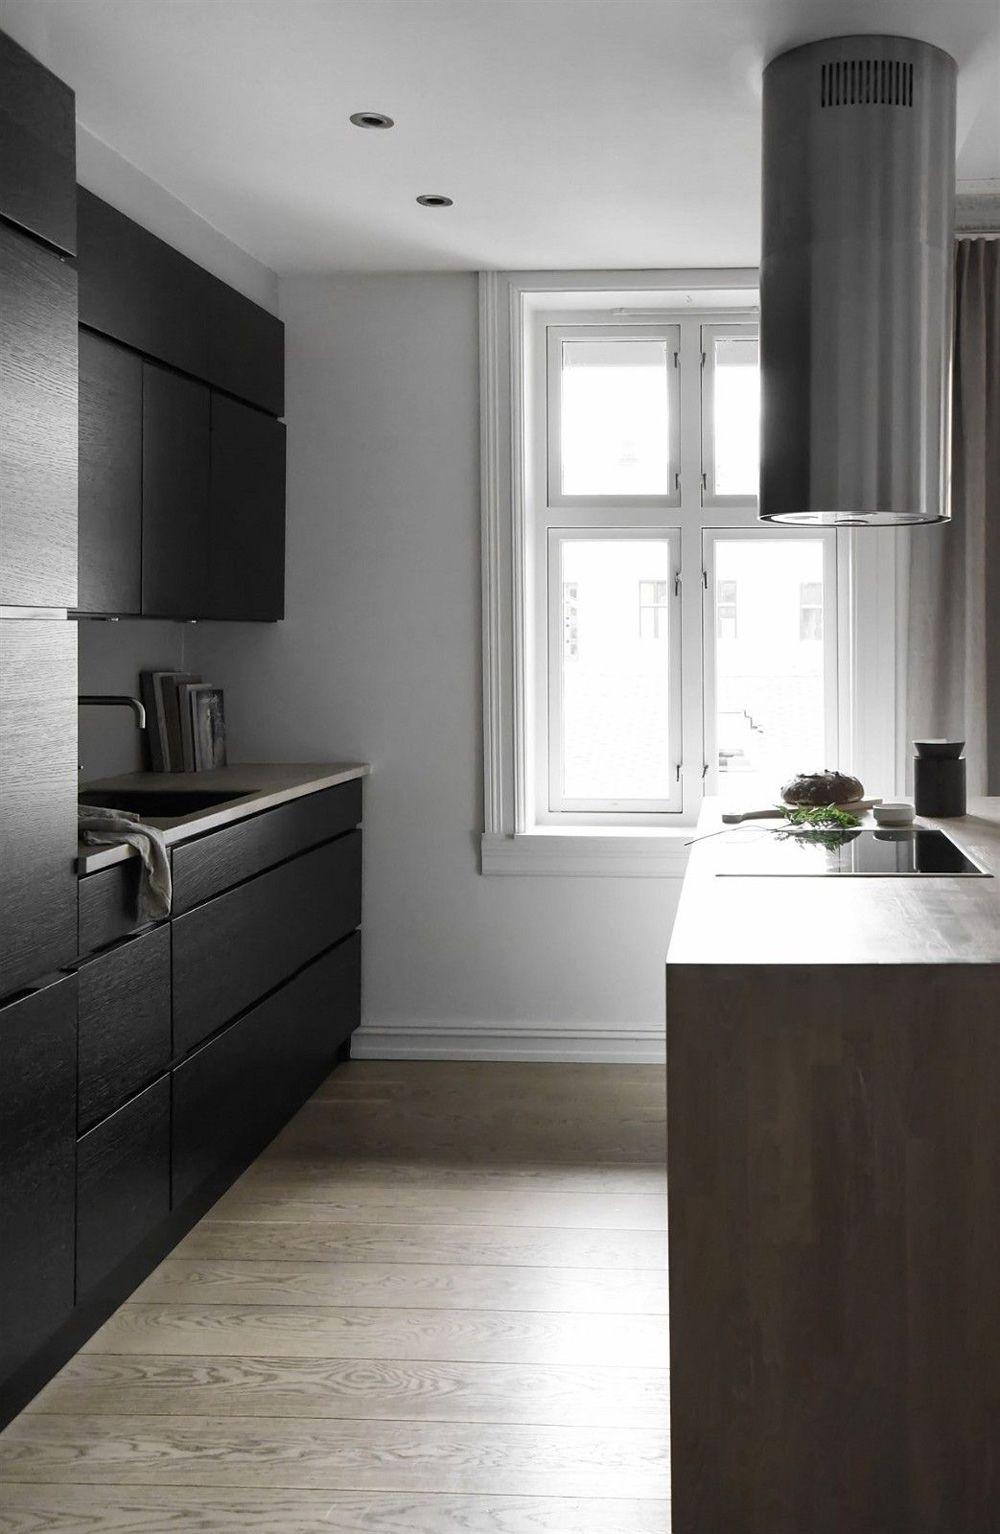 Inside The Perfectly Styled Home Of Norwegian Interior Designer And Blogger Elisabeth Heier Contemporary Interior Design Interior Interior Design